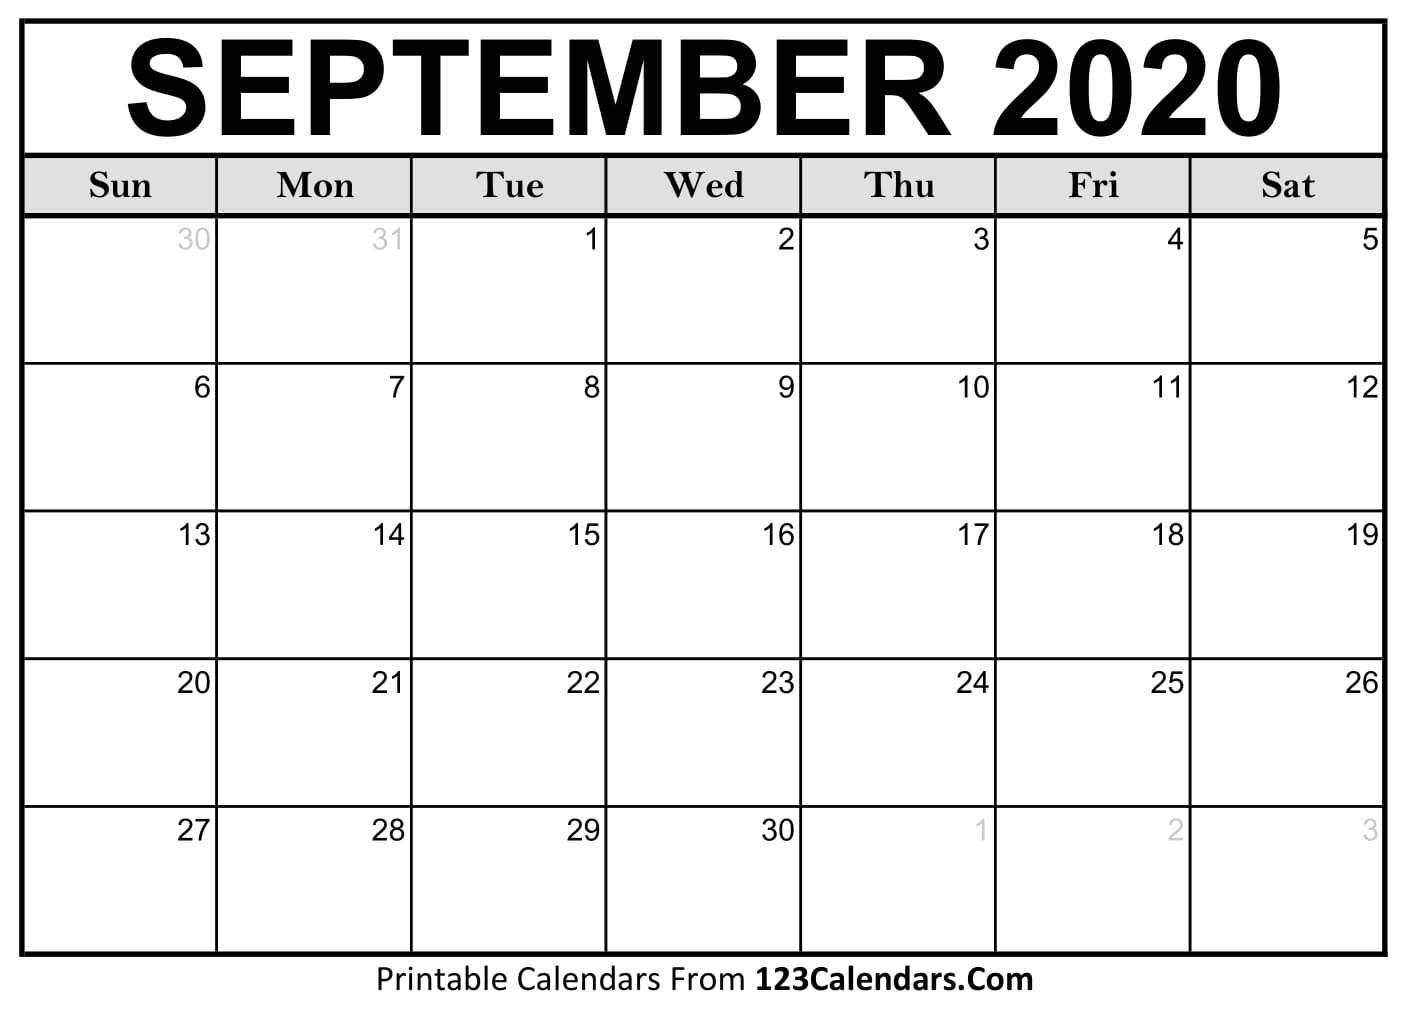 September 2020 Printable Calendar | 123Calendars